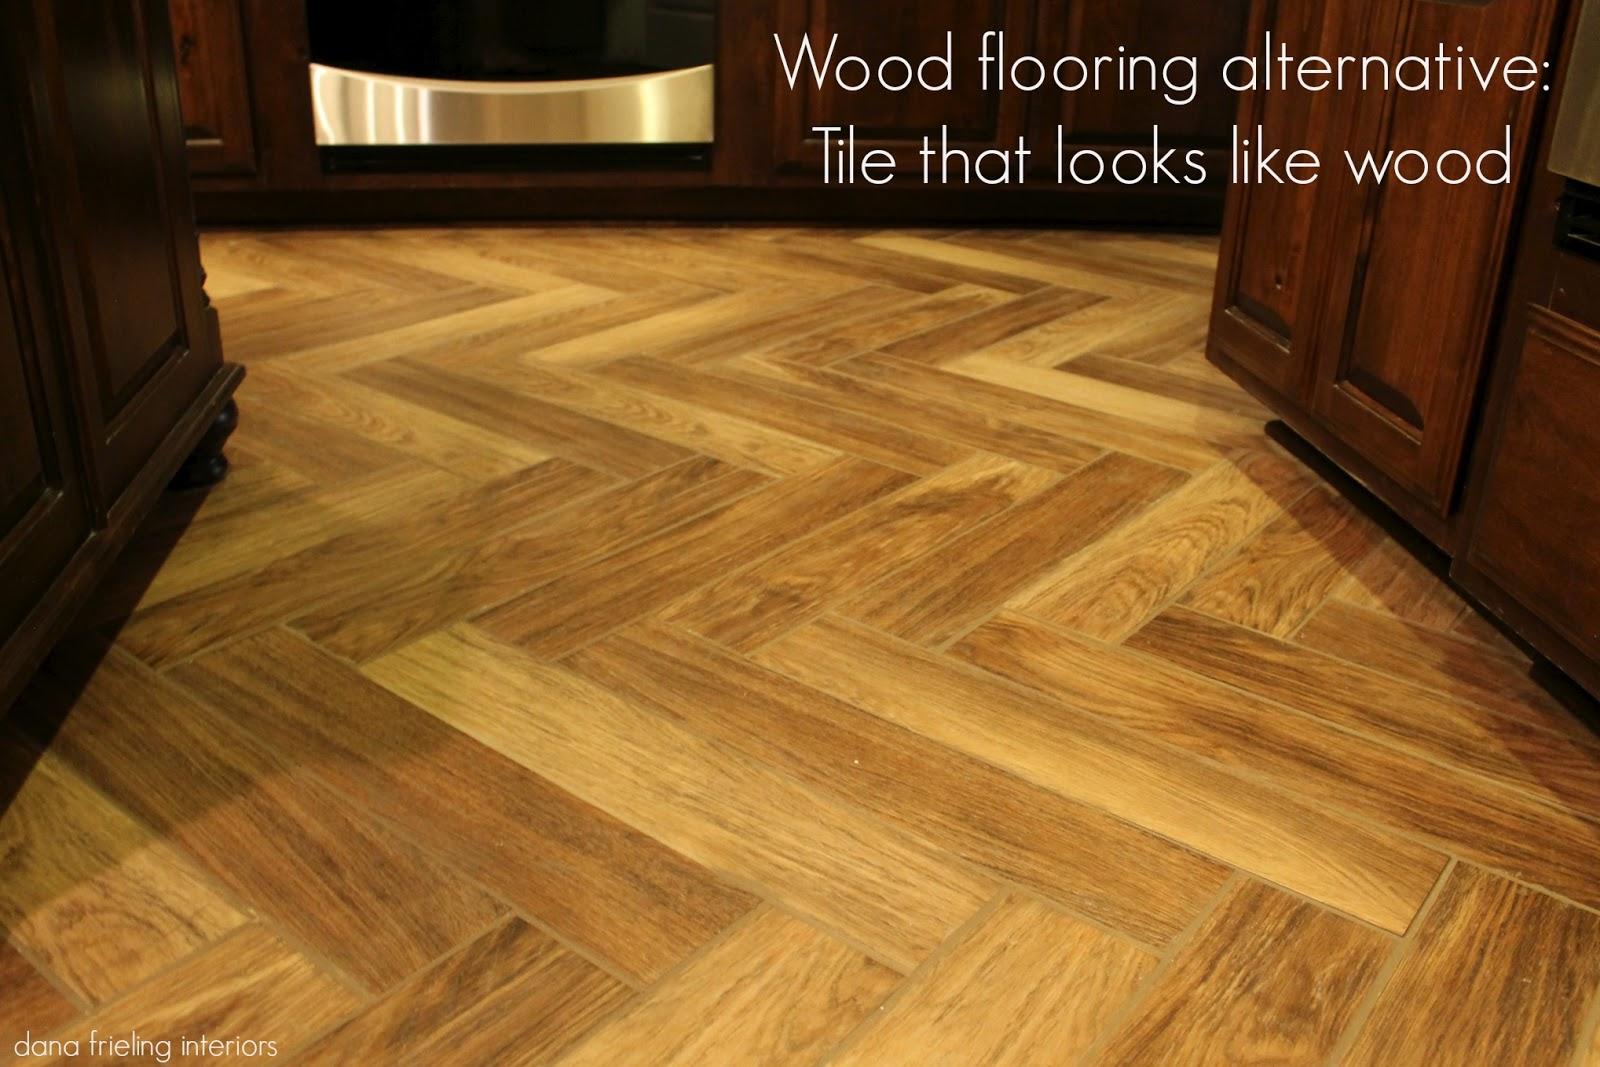 Make Them Wonder: Another Wood floor alternative